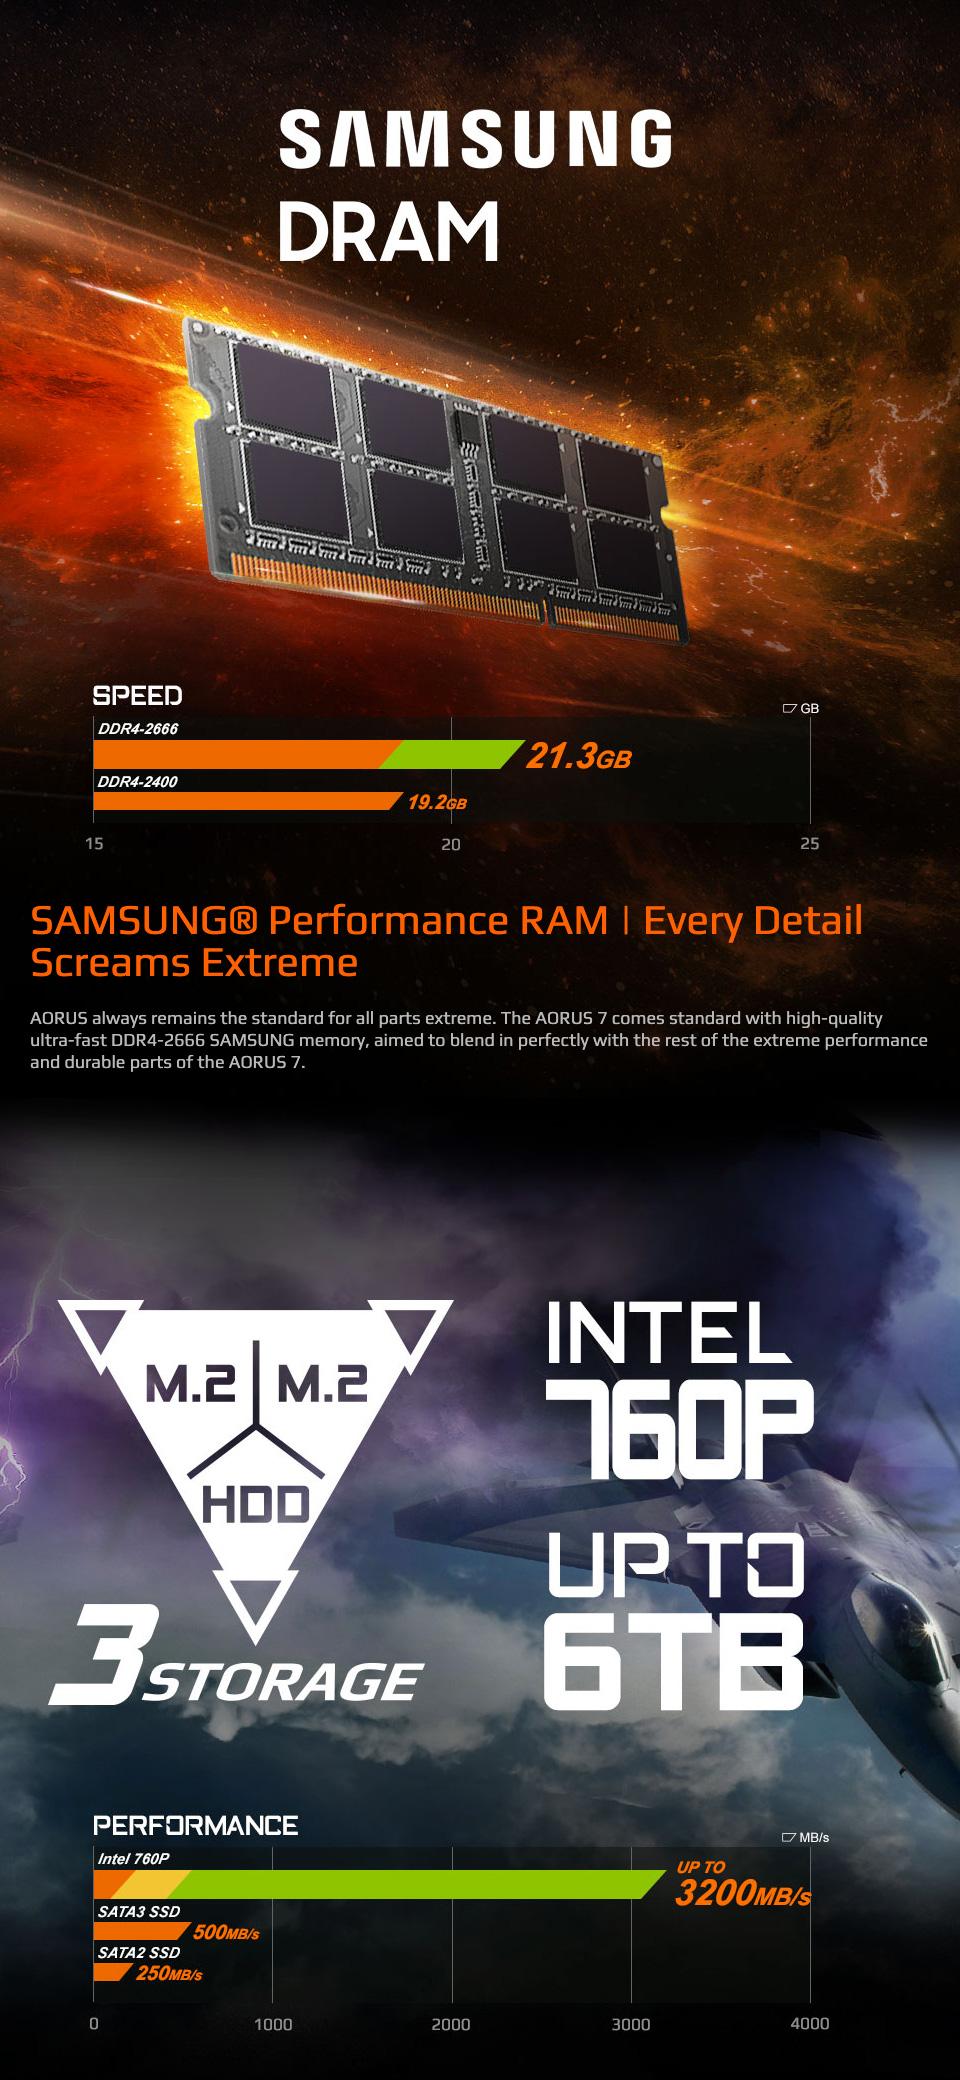 Gigabyte Aorus 7 Core i7 GTX 1660Ti 17.3in 144 Hz Notebook features 4